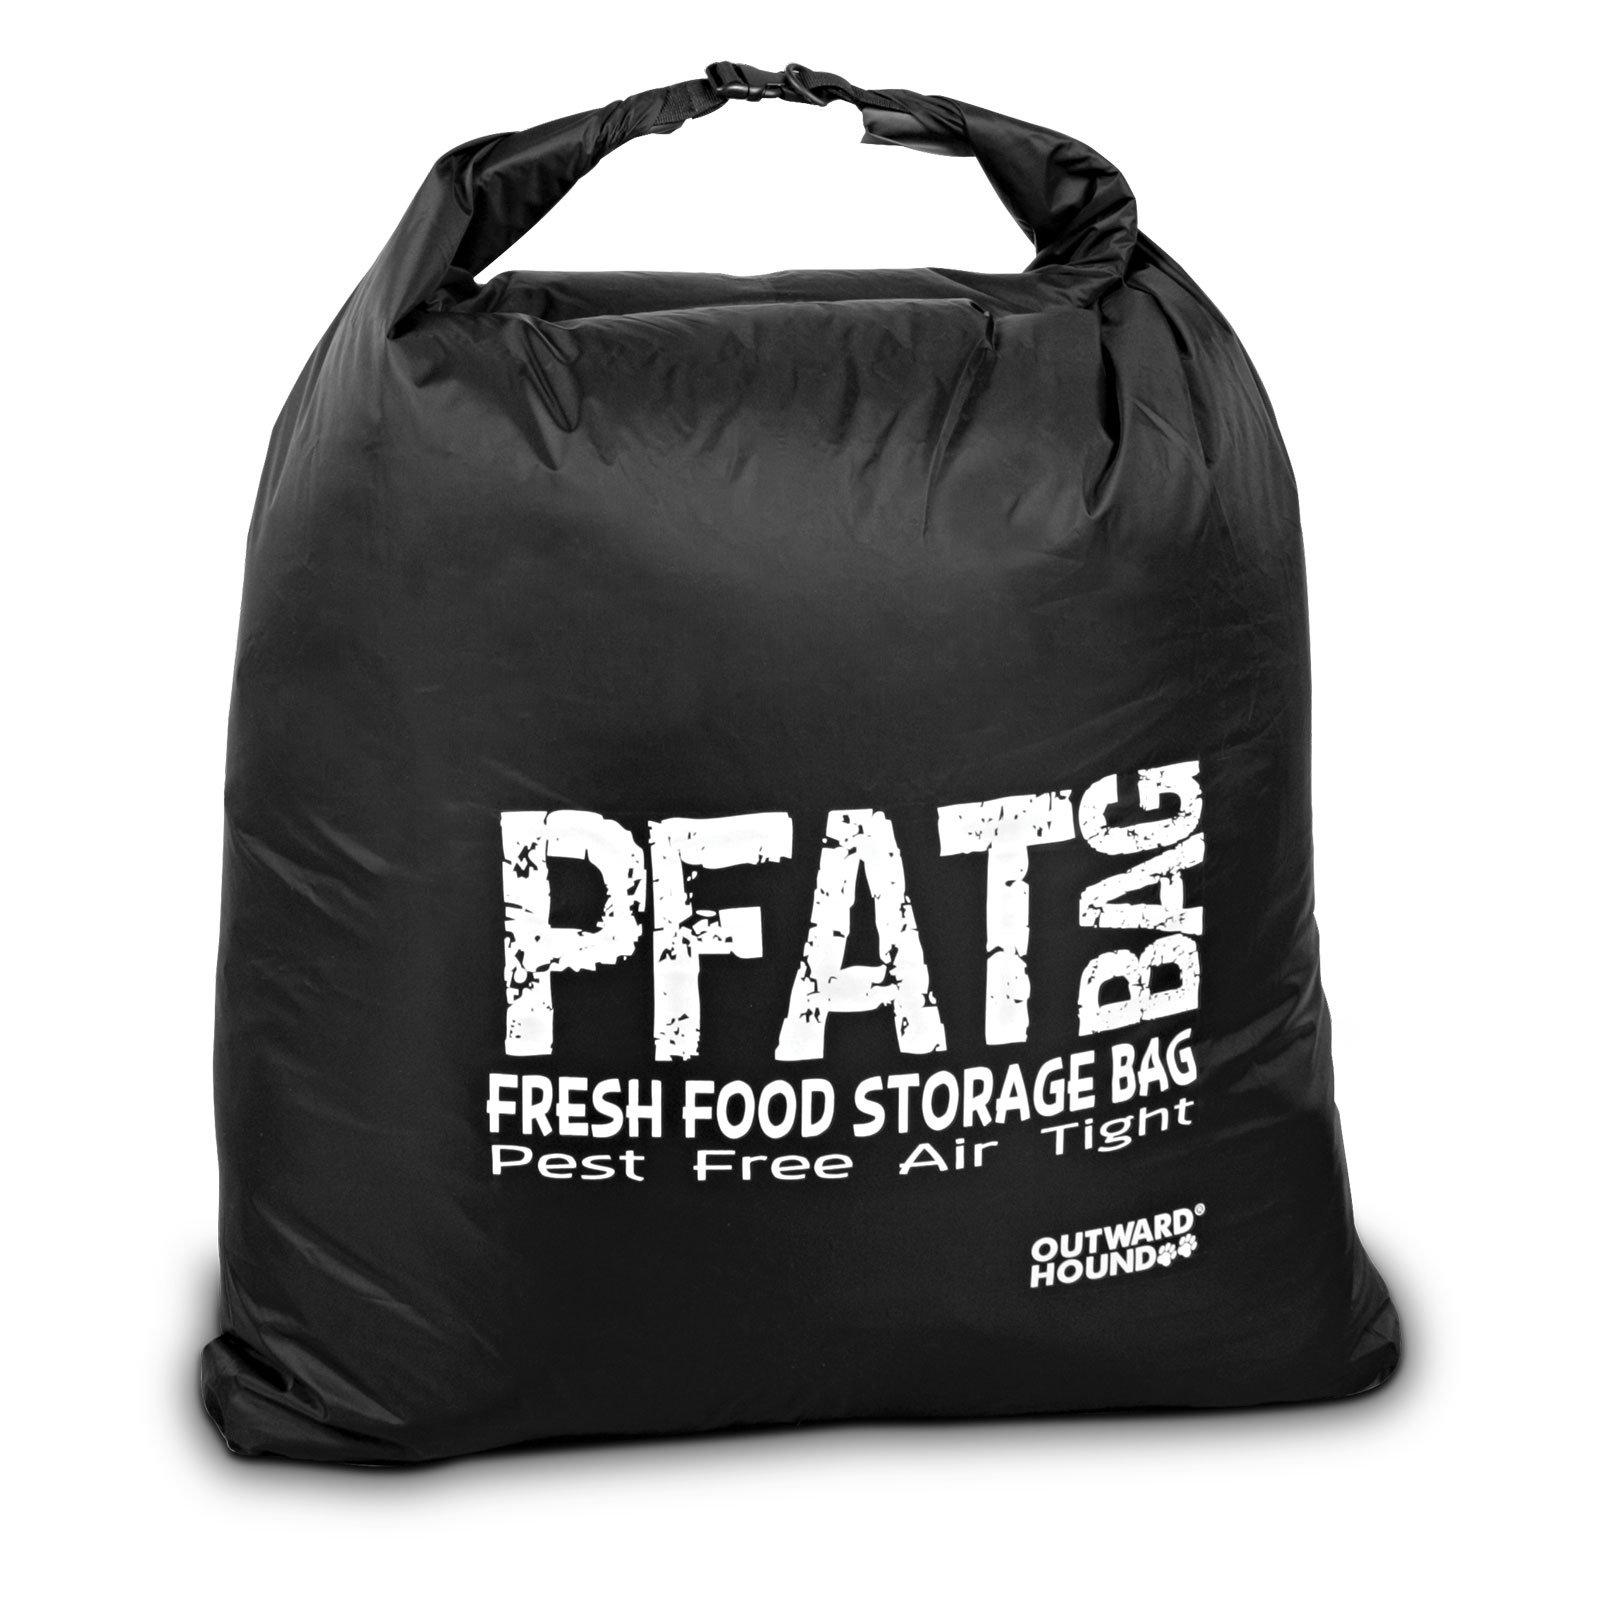 Outward Hound Kyjen  2685 PFAT Bag Storage Dog Food Container Solution, Large, Black